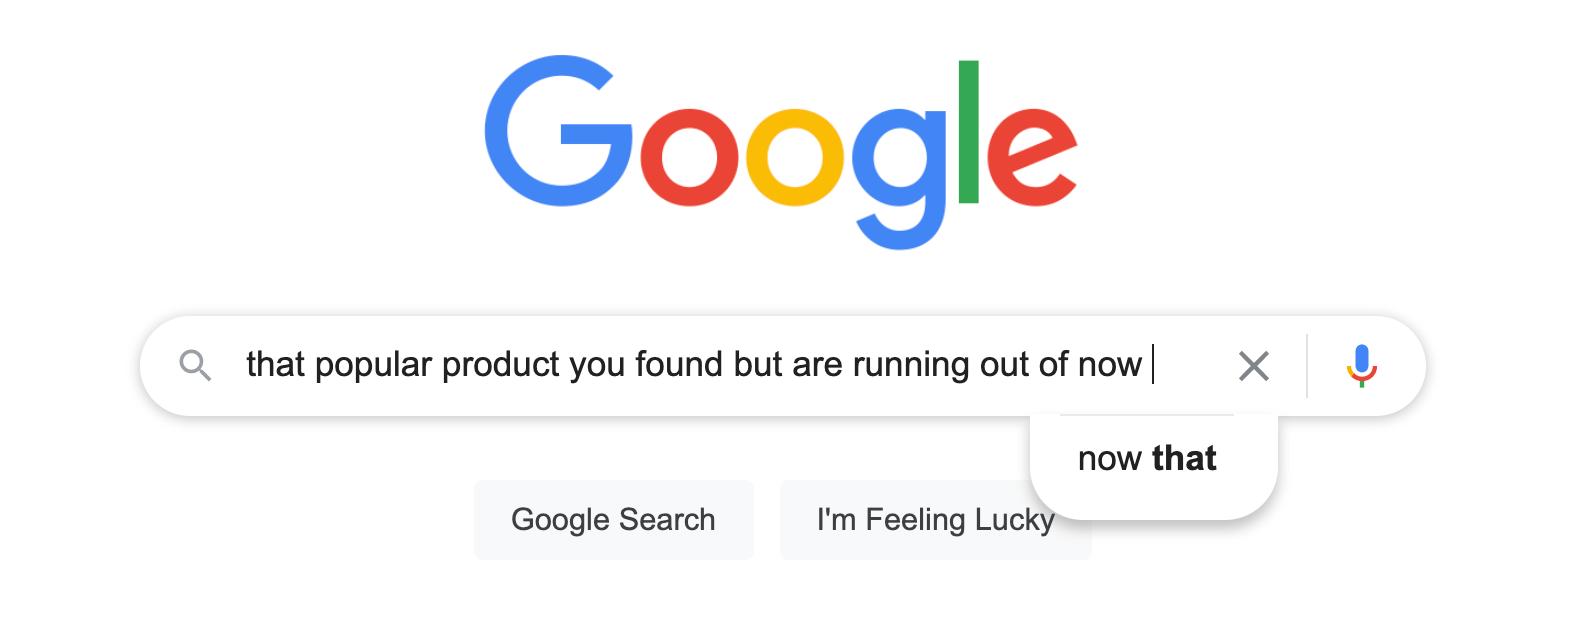 Amazon product hunting on Google